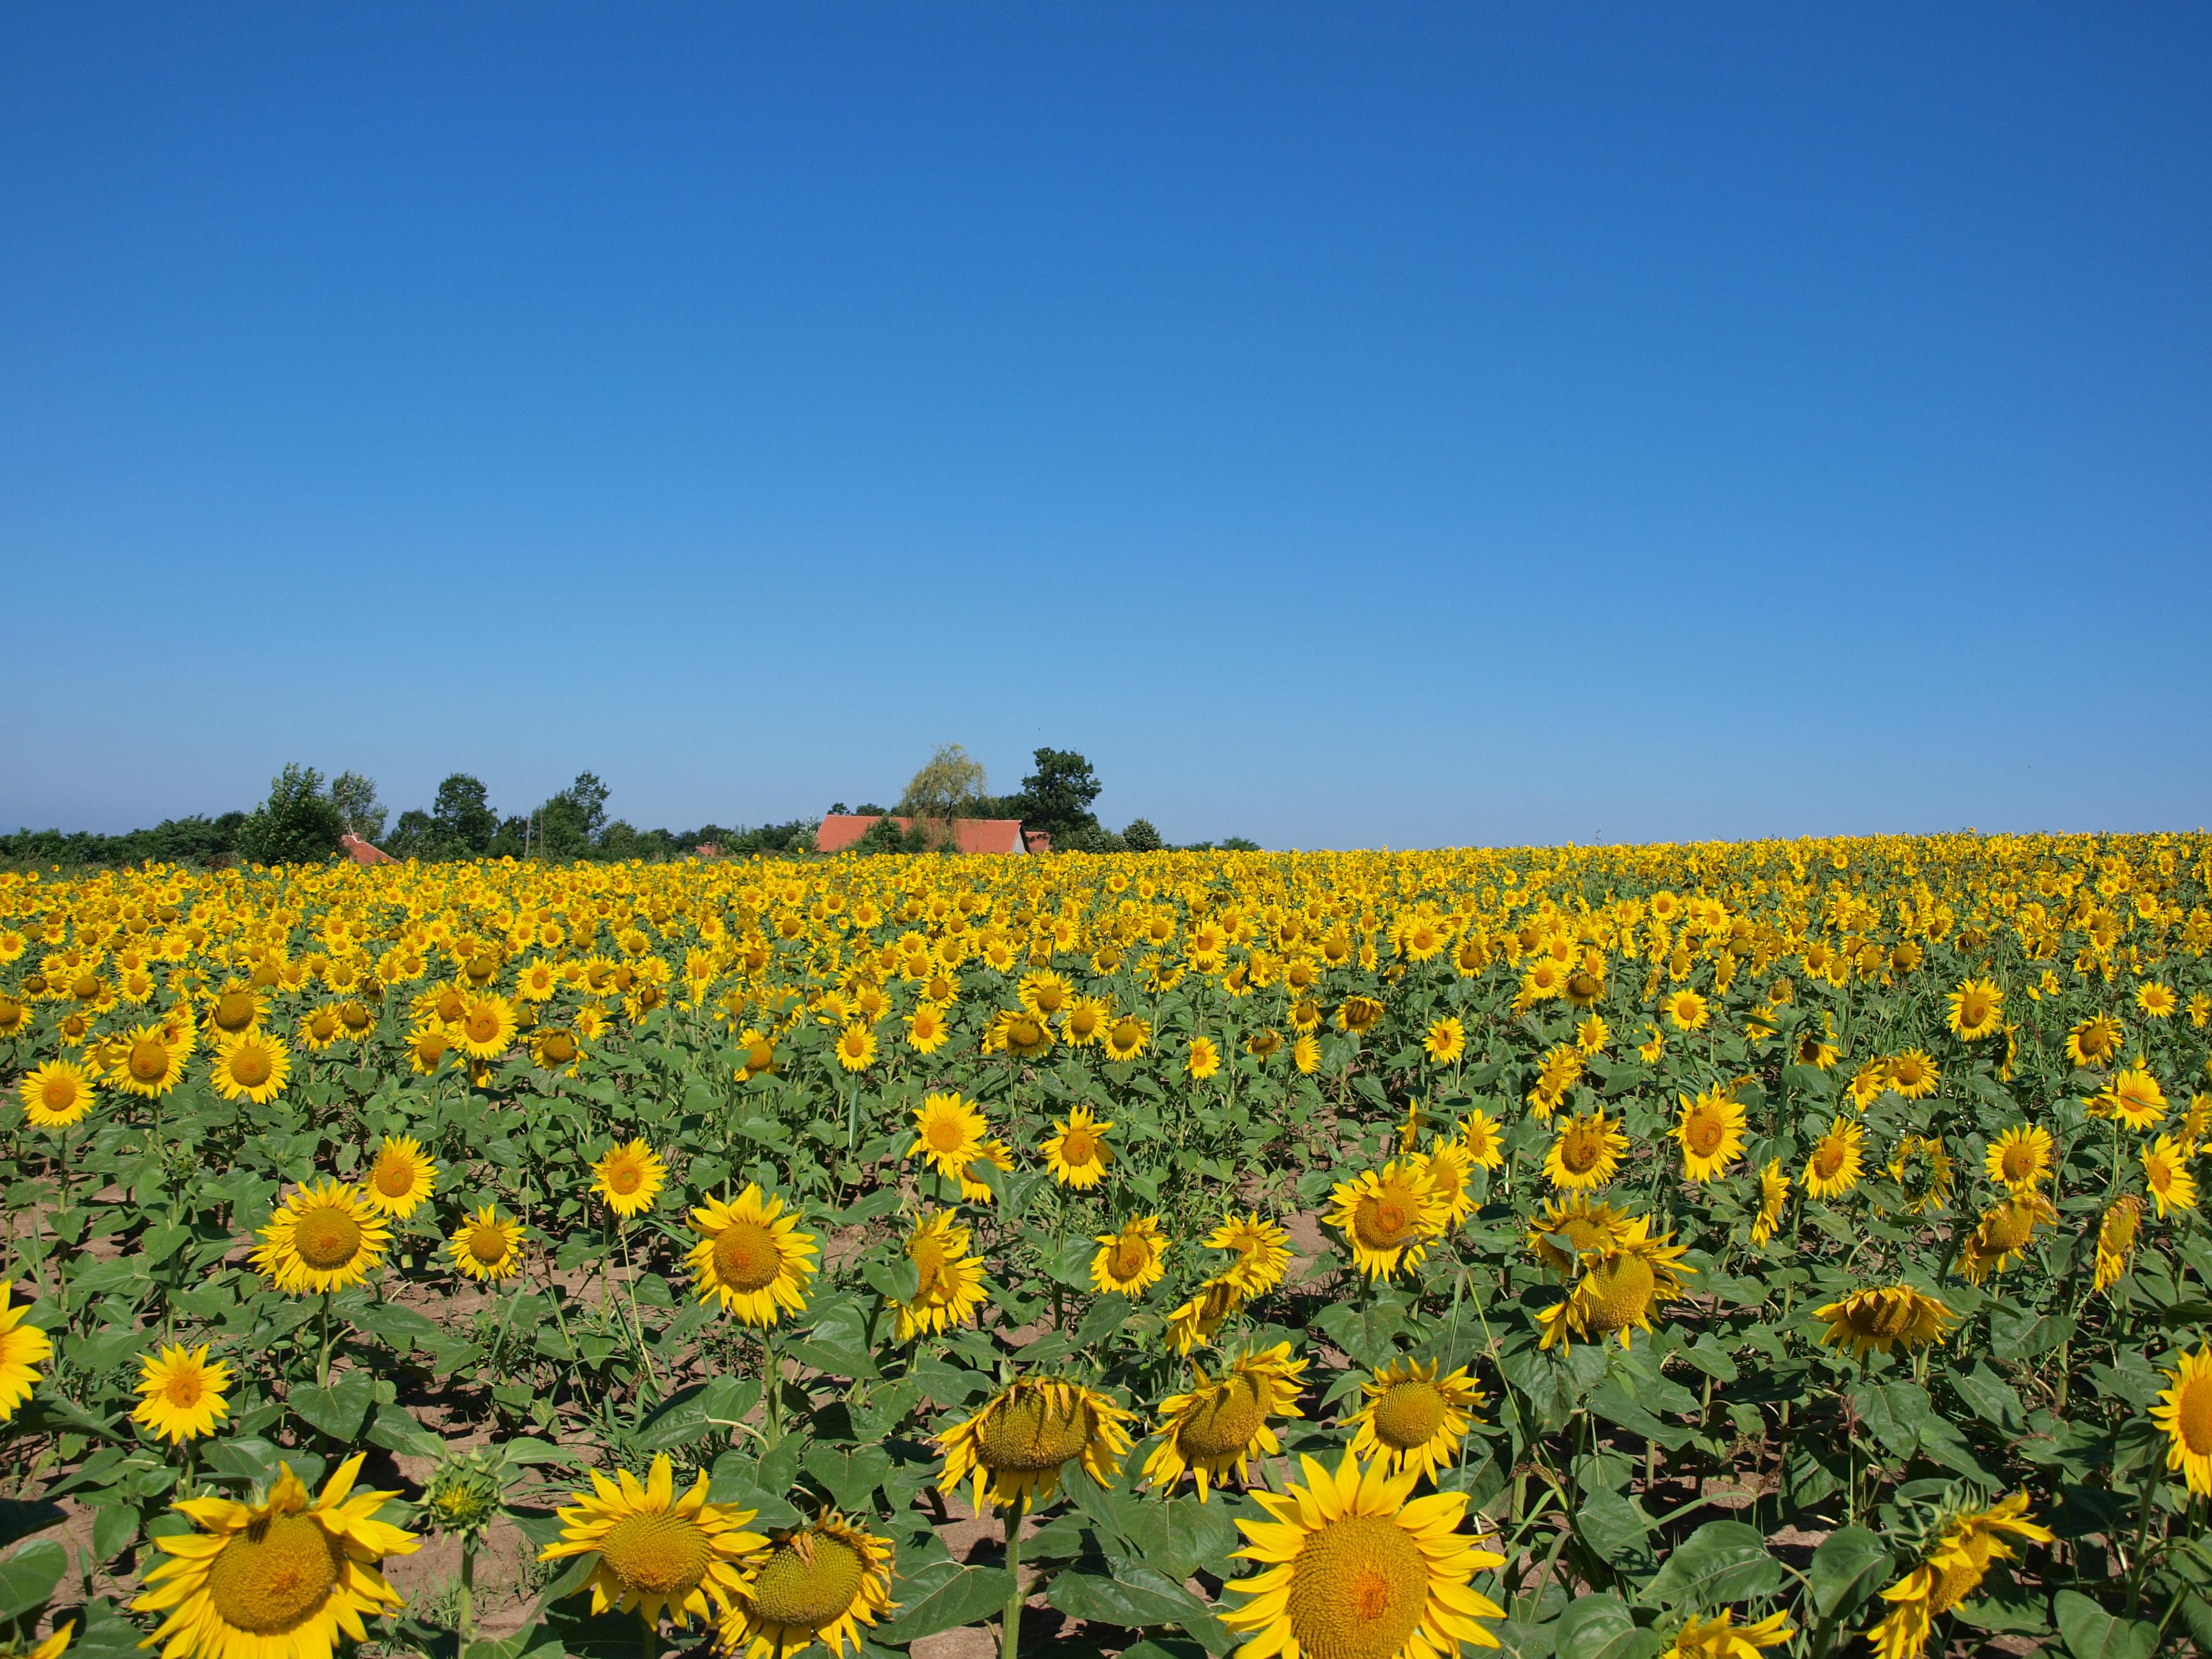 Sunflower Field Clipart Sunflower Field Hungary File Sunflower Fields In Umadija Jpg Wikimedia